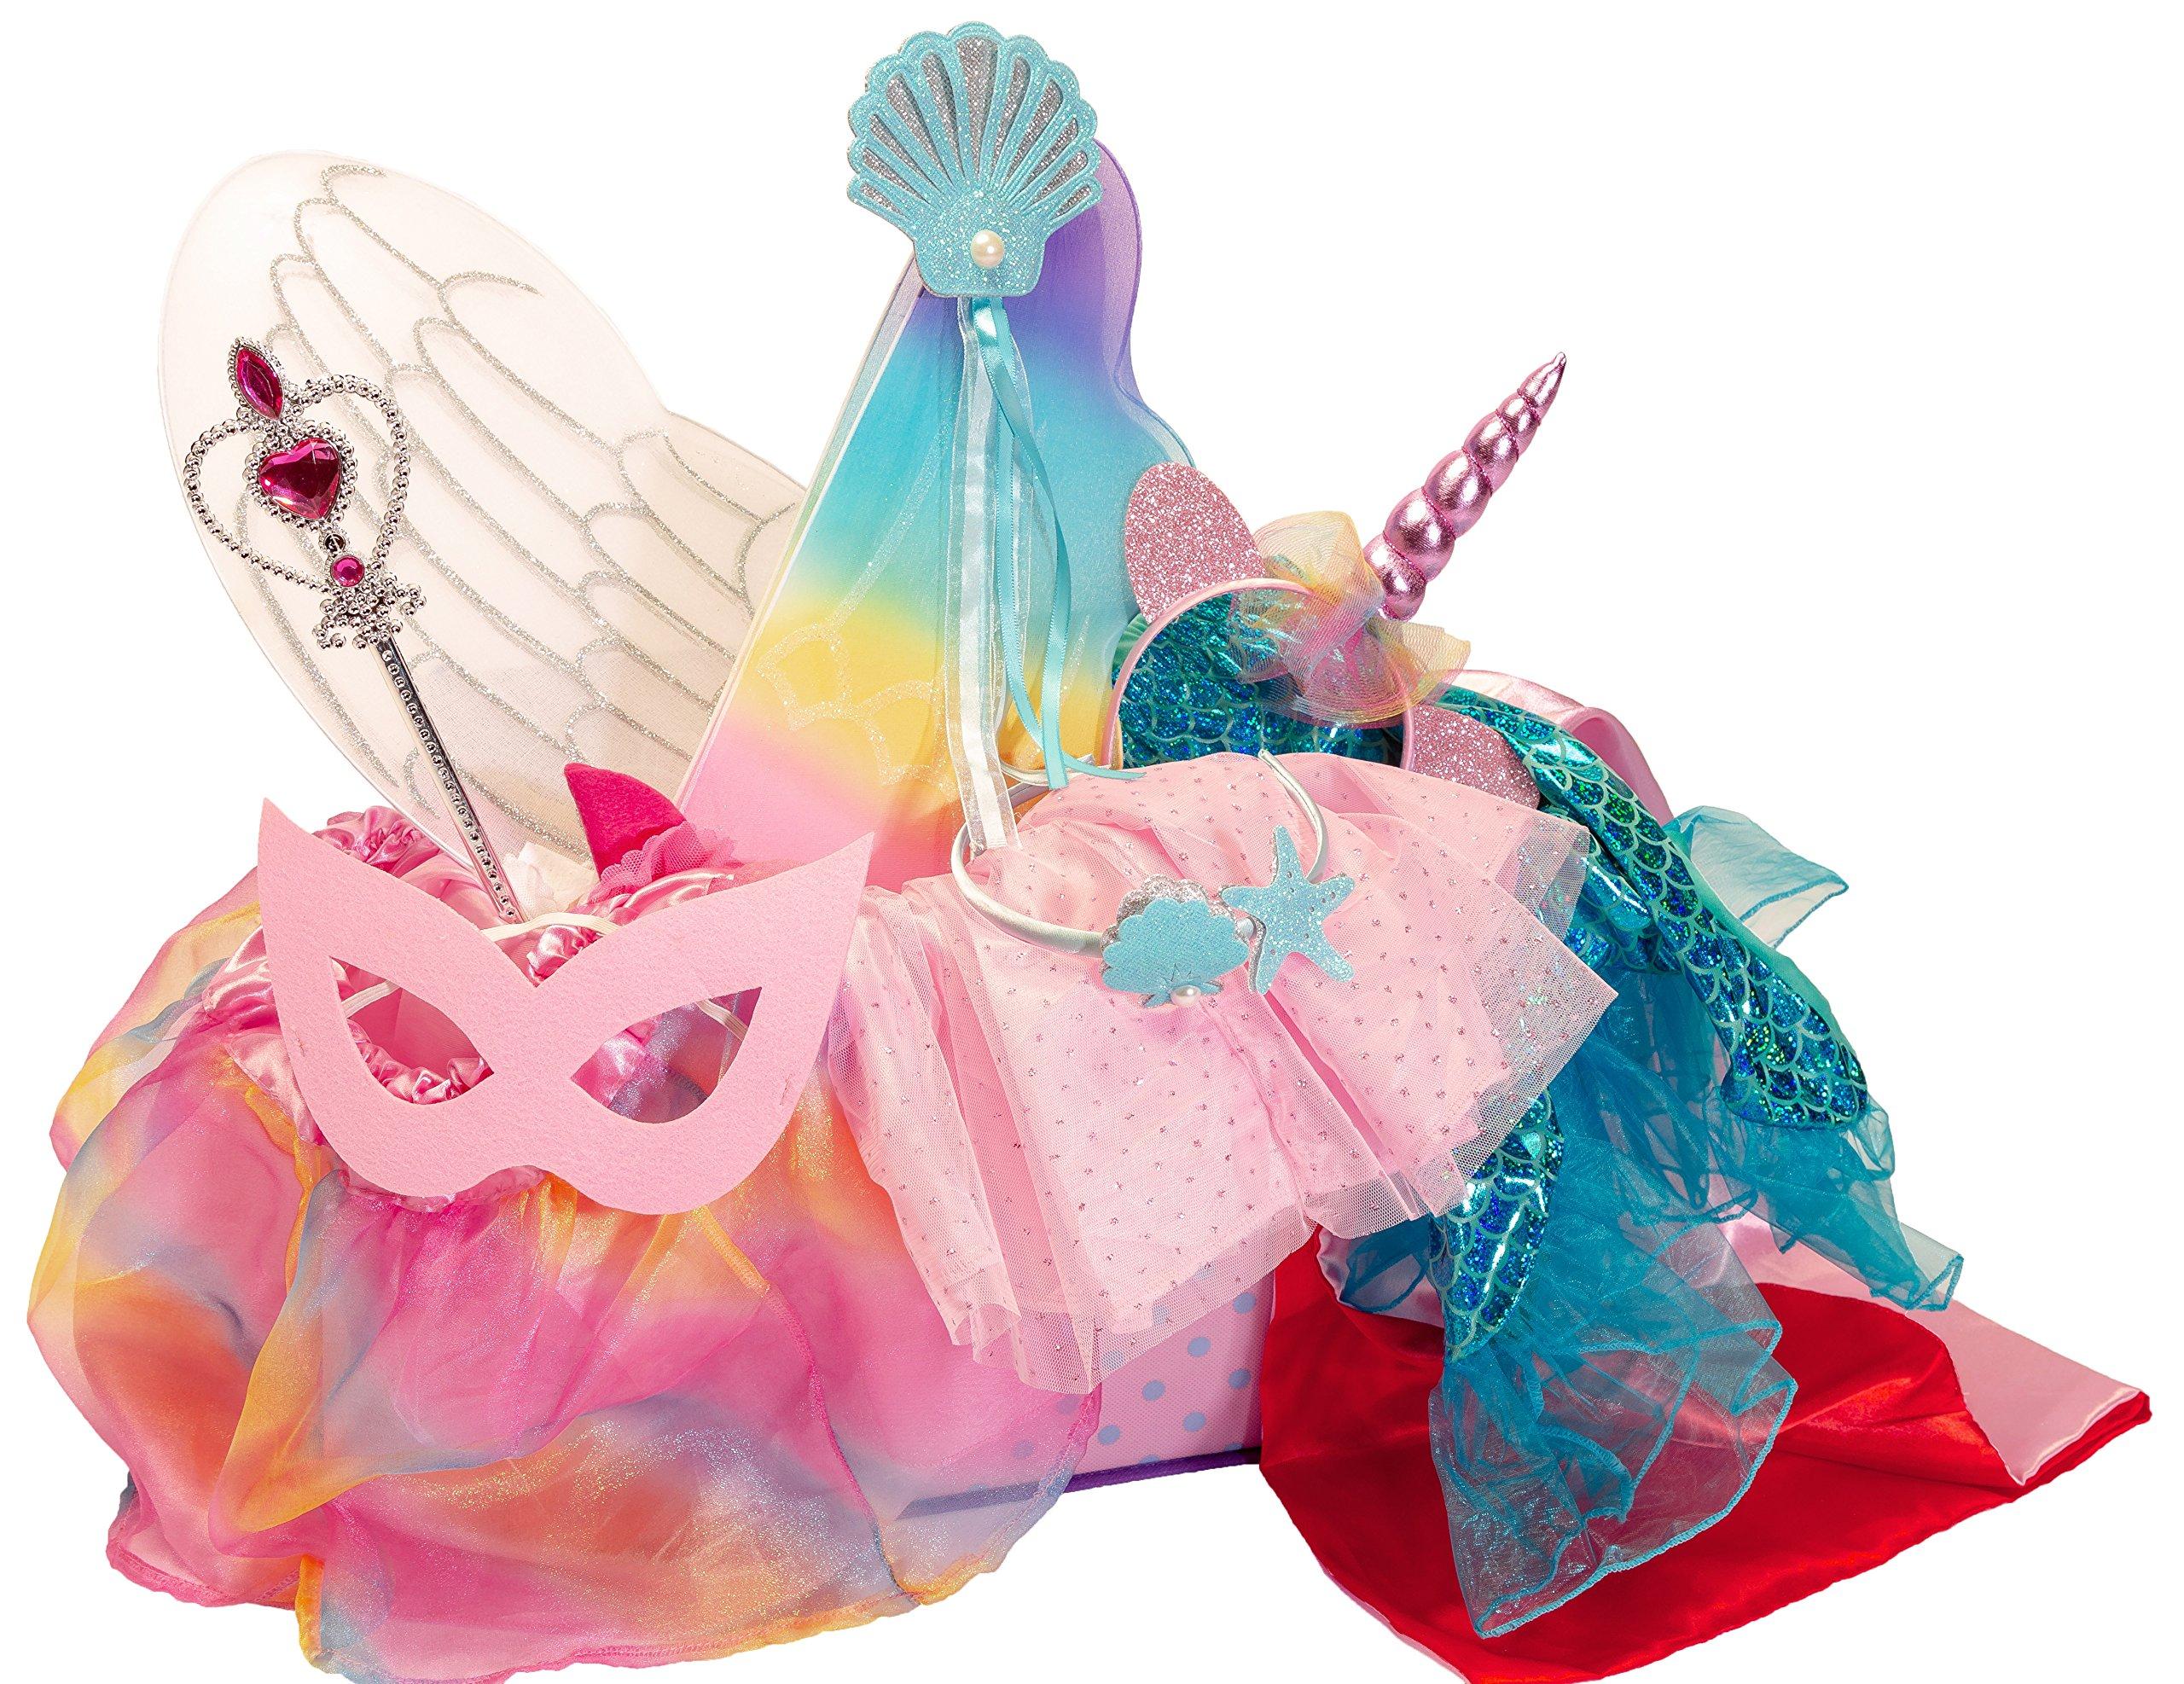 Girls Dress Up Set: Unicorn, Superhero, Angel, Mermaid, Princess - with Storage bin Pink